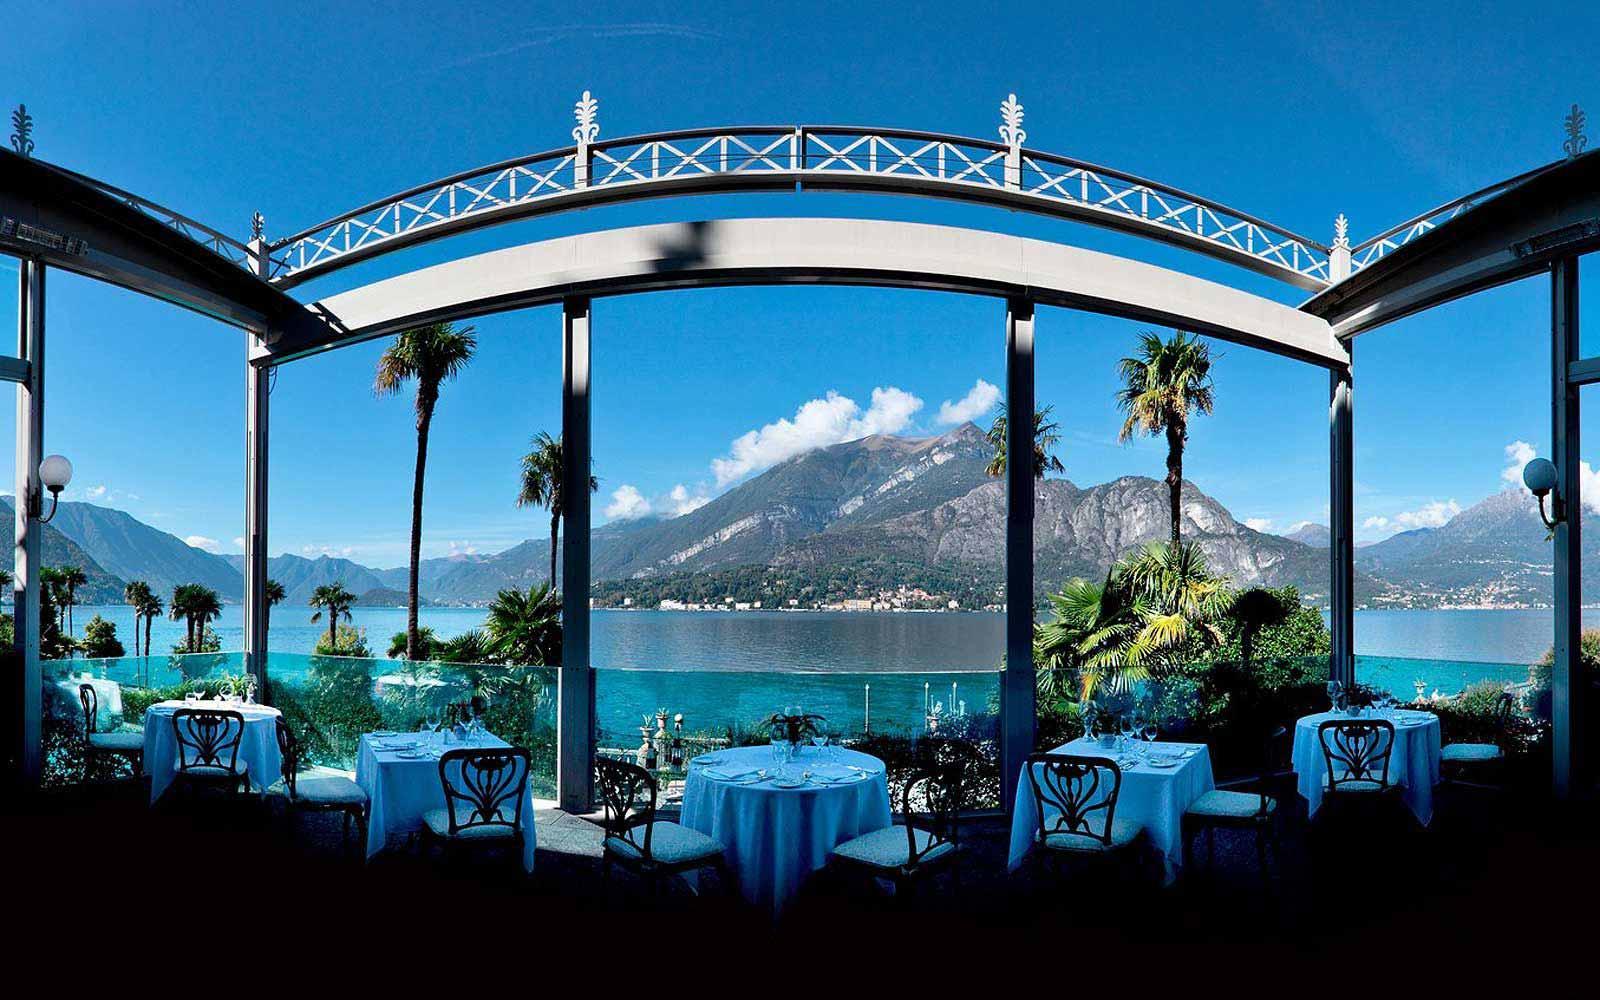 grand hotel villa serbelloni lake como lakes italy. Black Bedroom Furniture Sets. Home Design Ideas